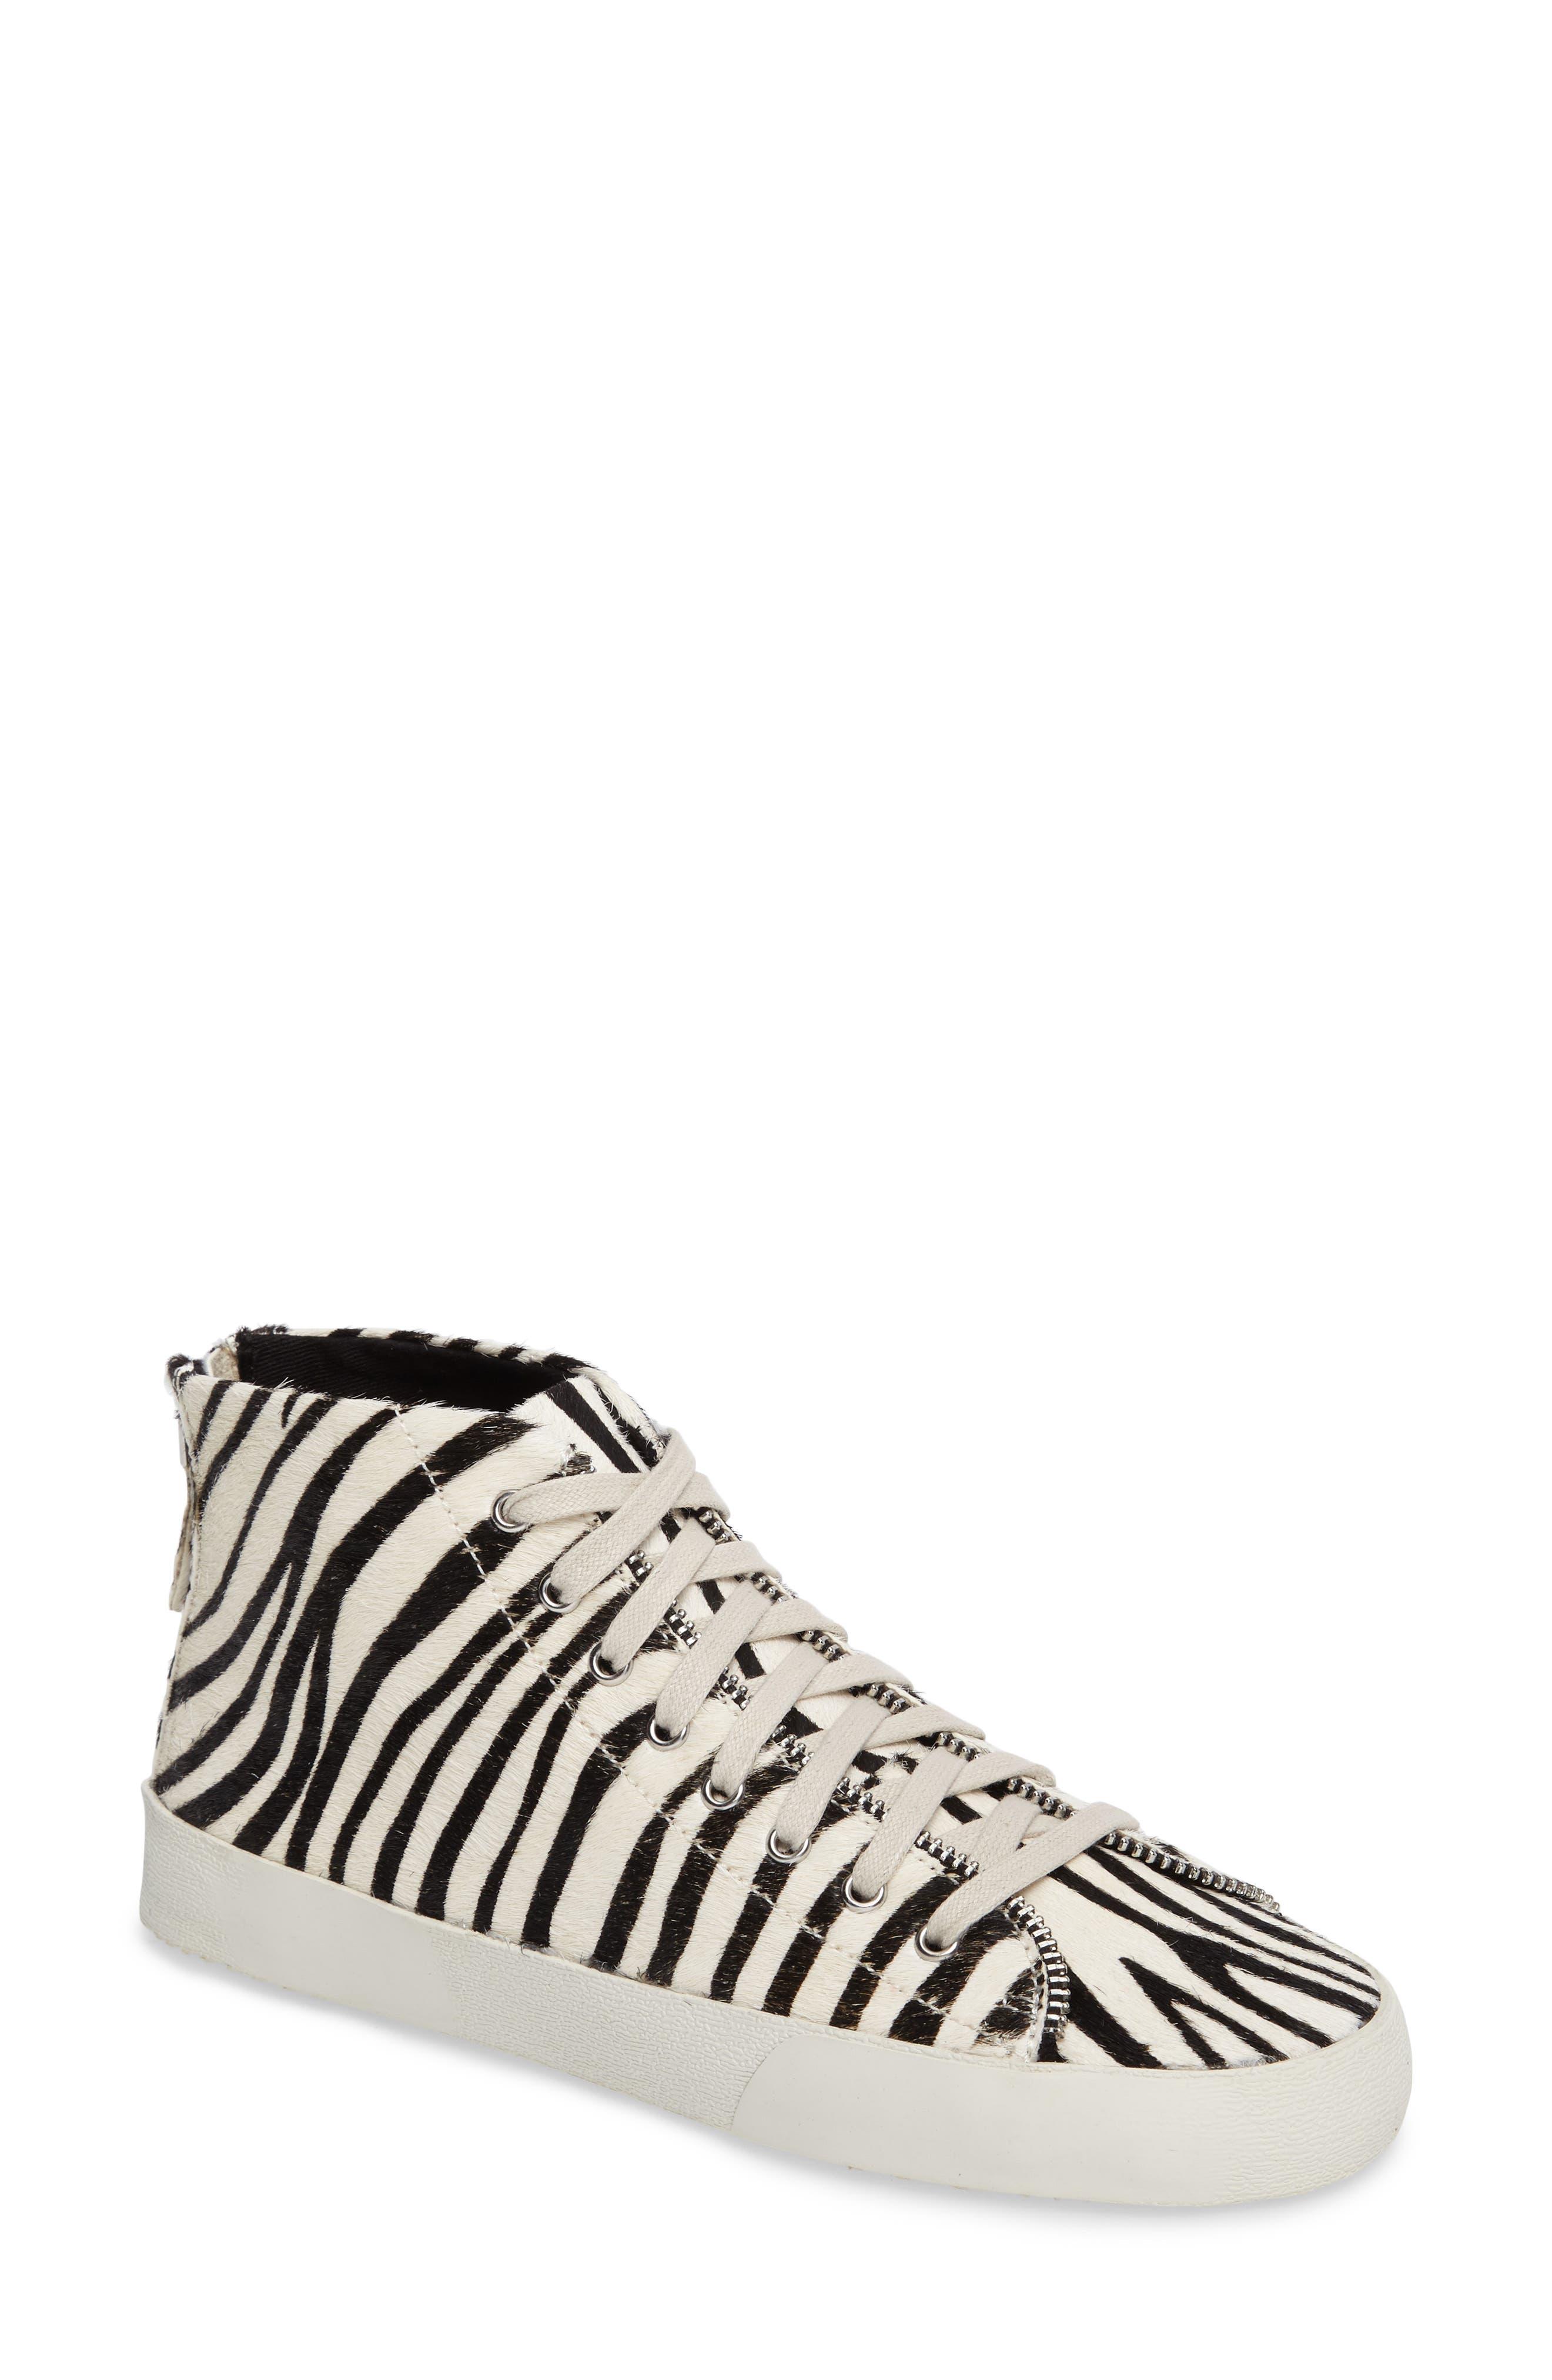 Alternate Image 1 Selected - Rebecca Minkoff Zaina Too Genuine Calf Hair Sneaker (Women)